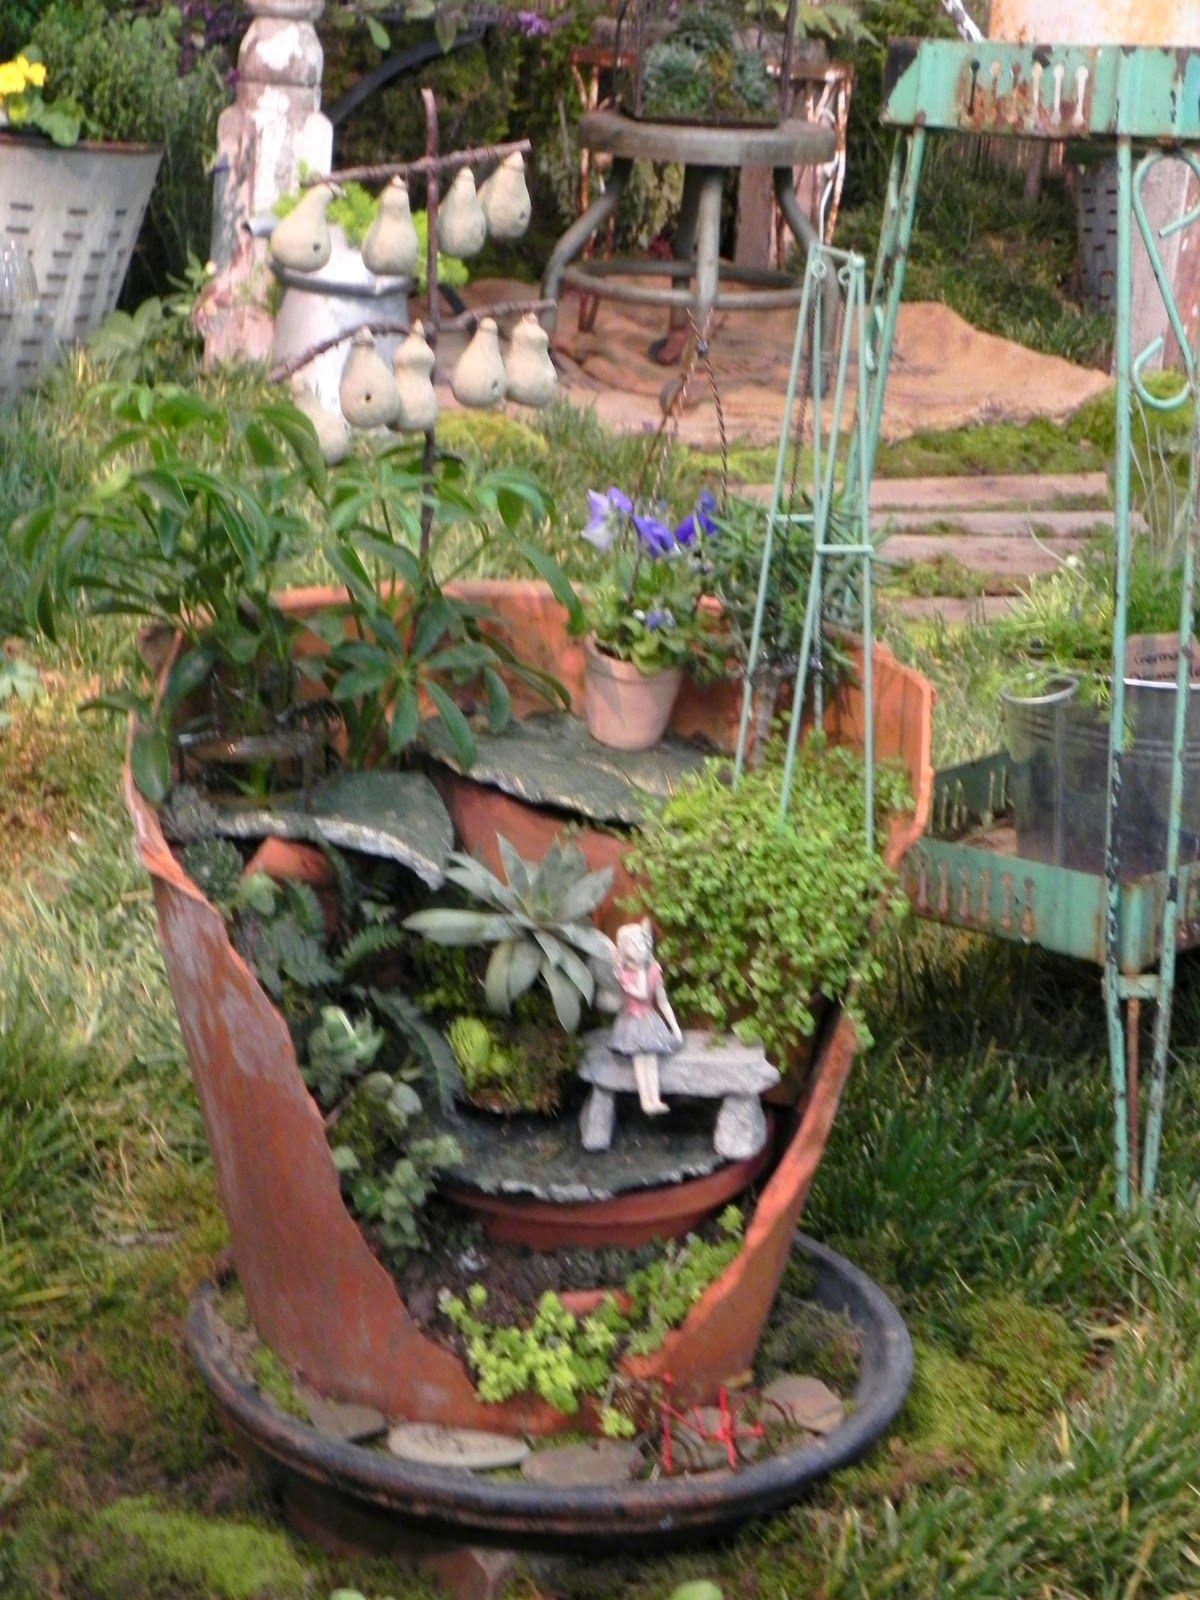 35 Fairy Garden Ideas in a Pot | Pinterest | Fairy garden pots ...